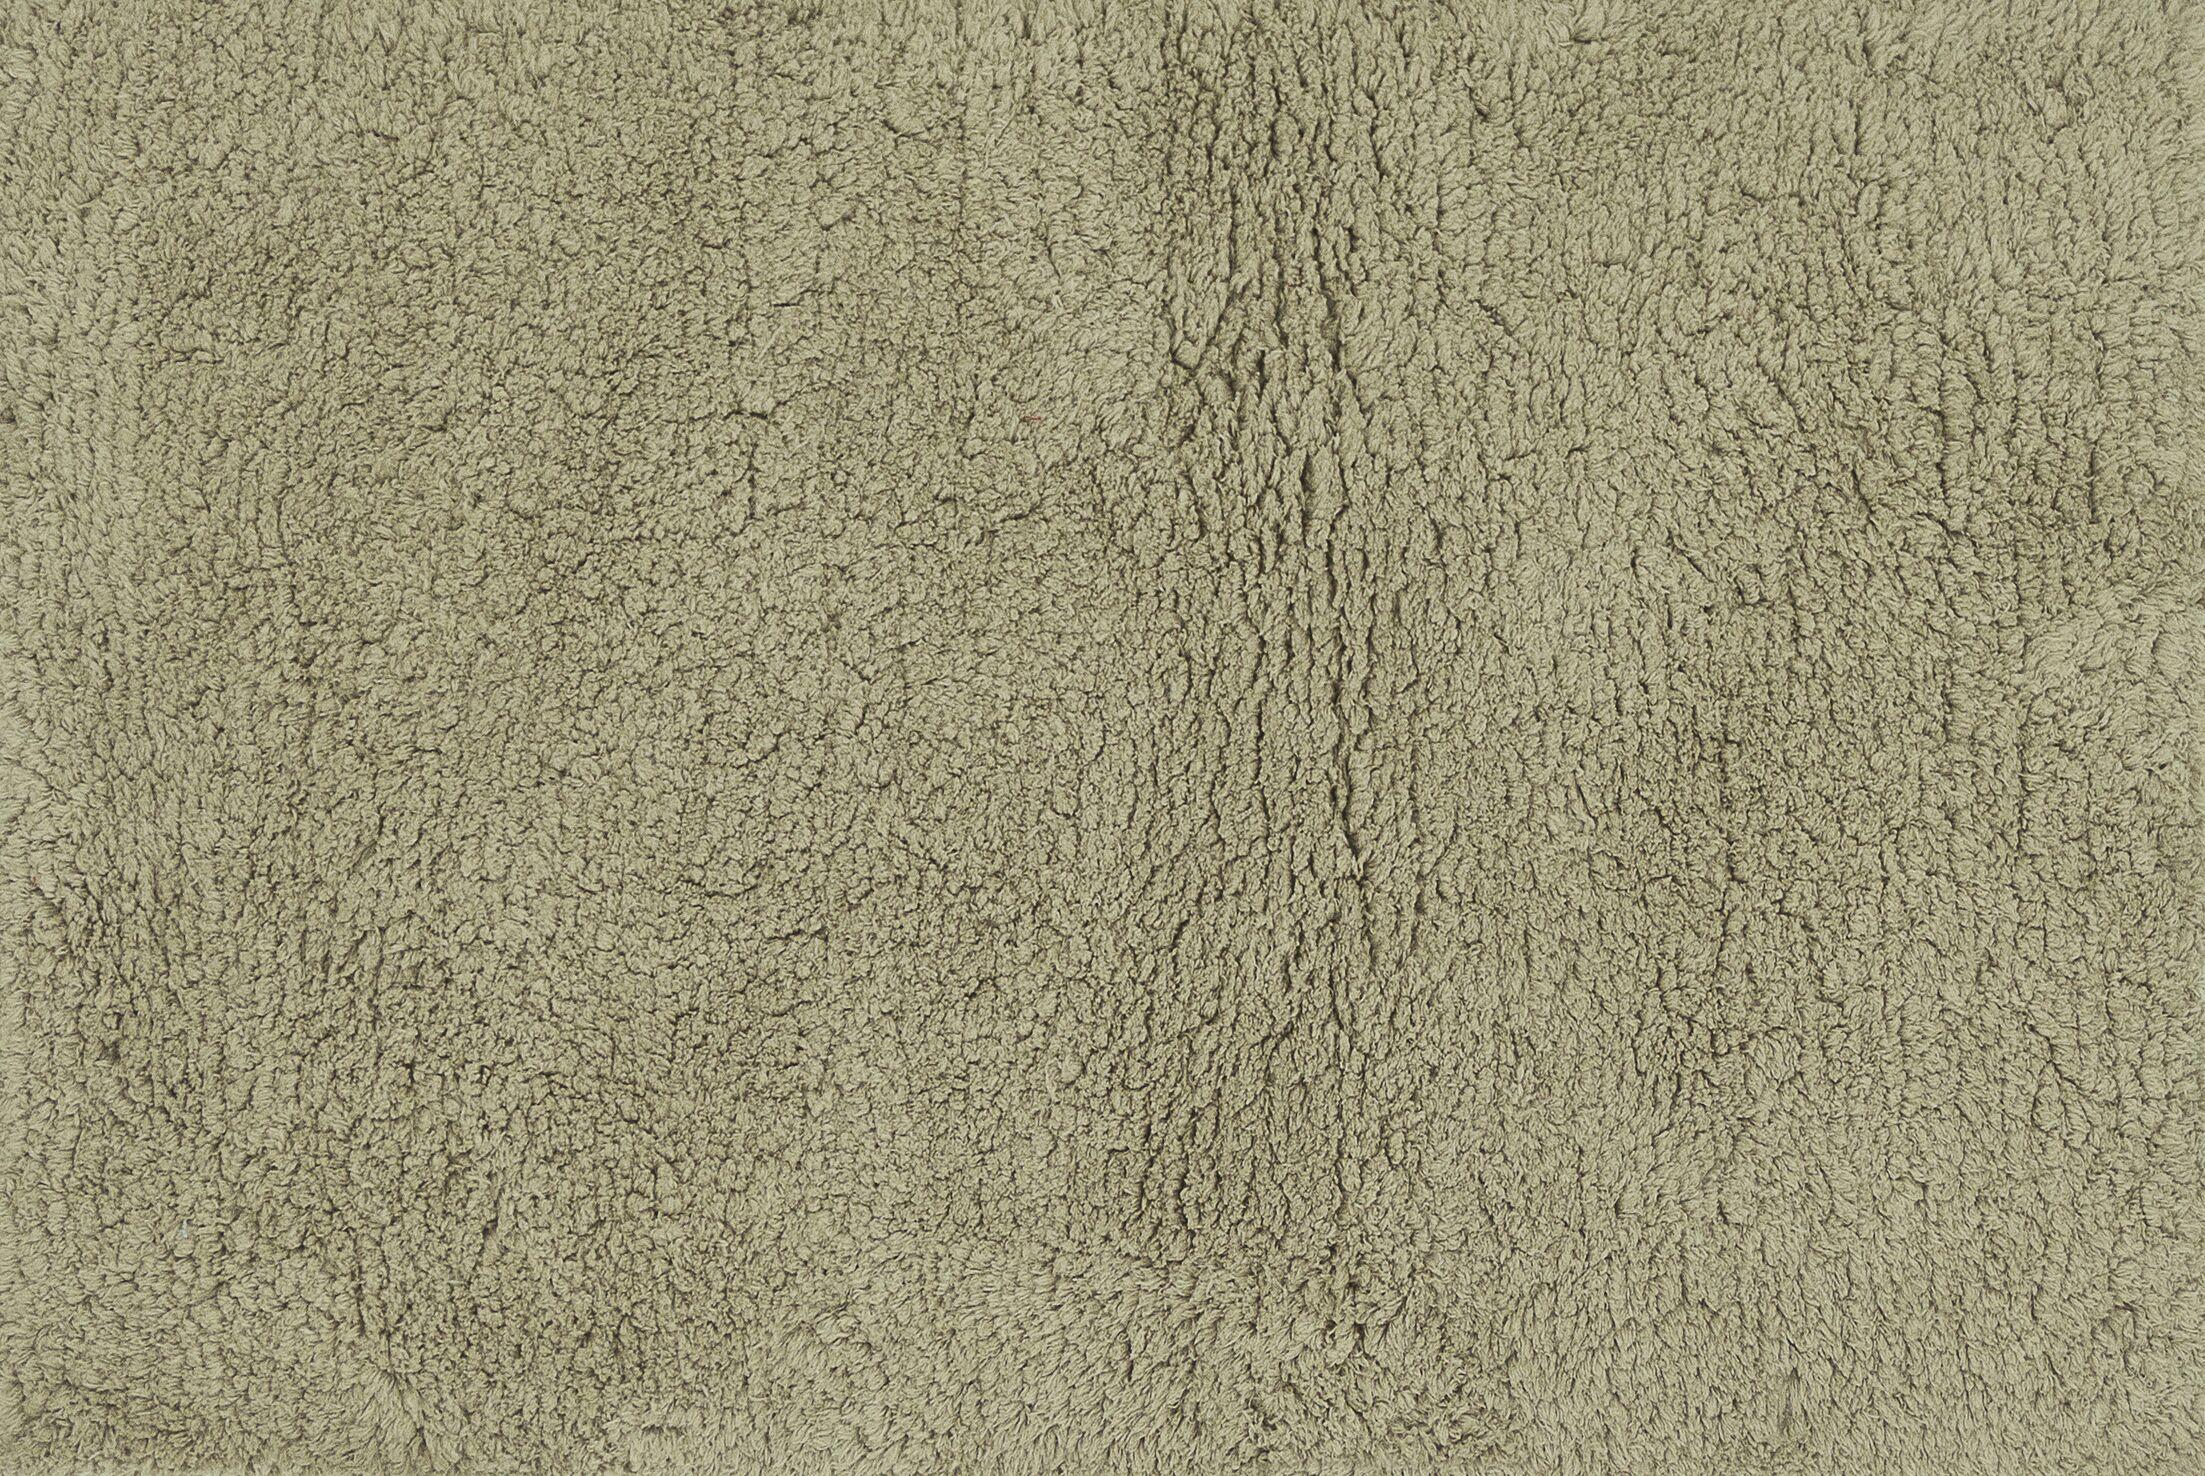 DeGennaro Hand-Tufted Beige Area Rug Rug Size: Rectangle 3'6